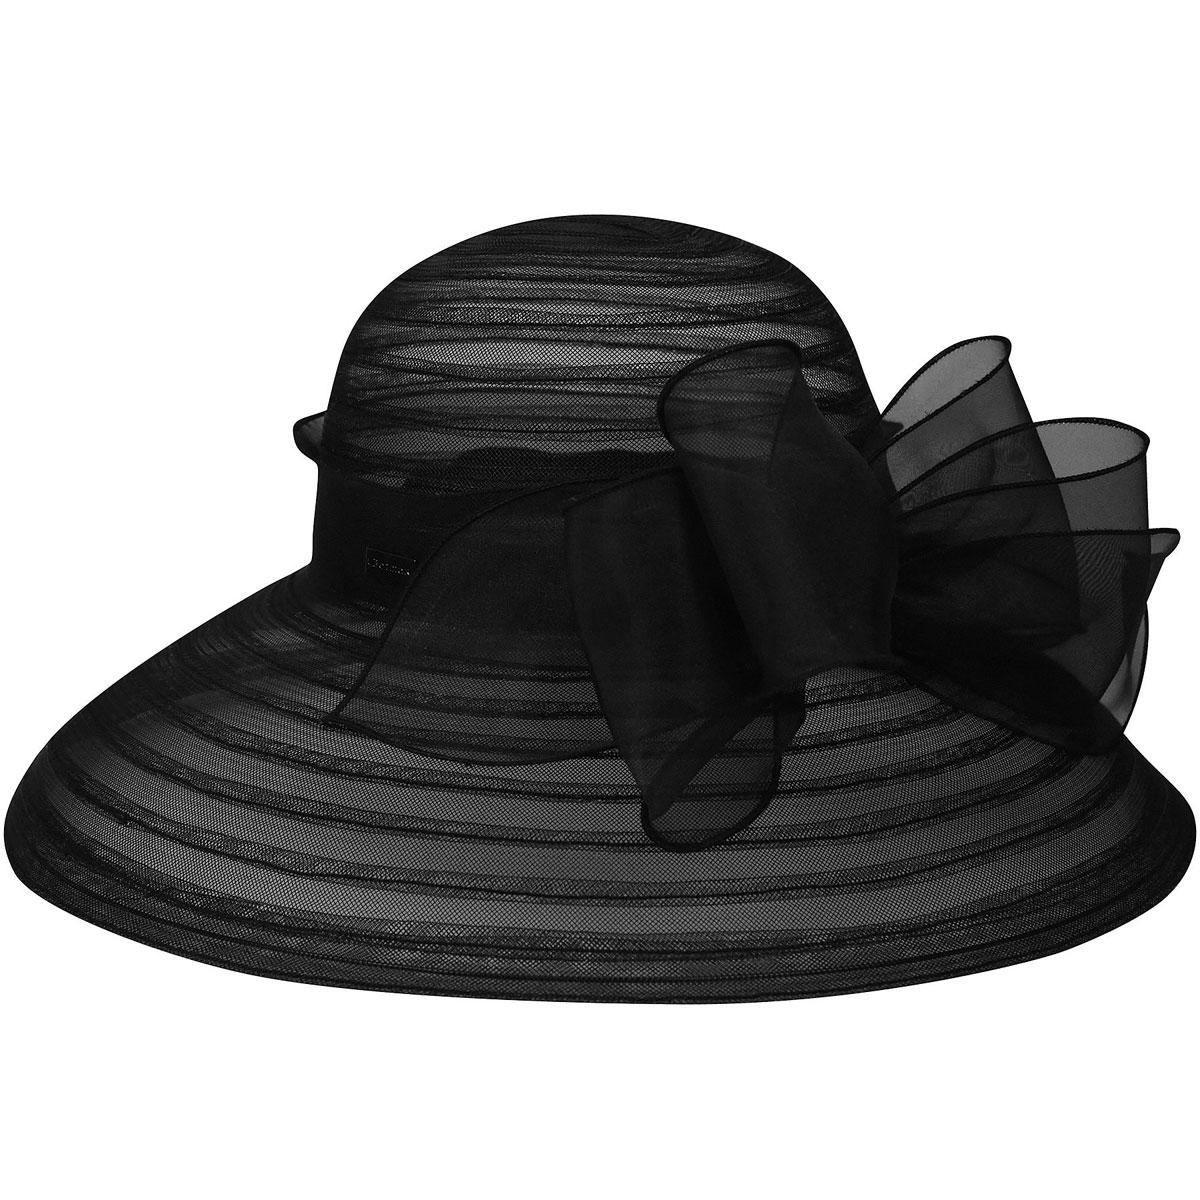 Betmar Valentina Asymmetric Wide Brim Occasion Hat in Black